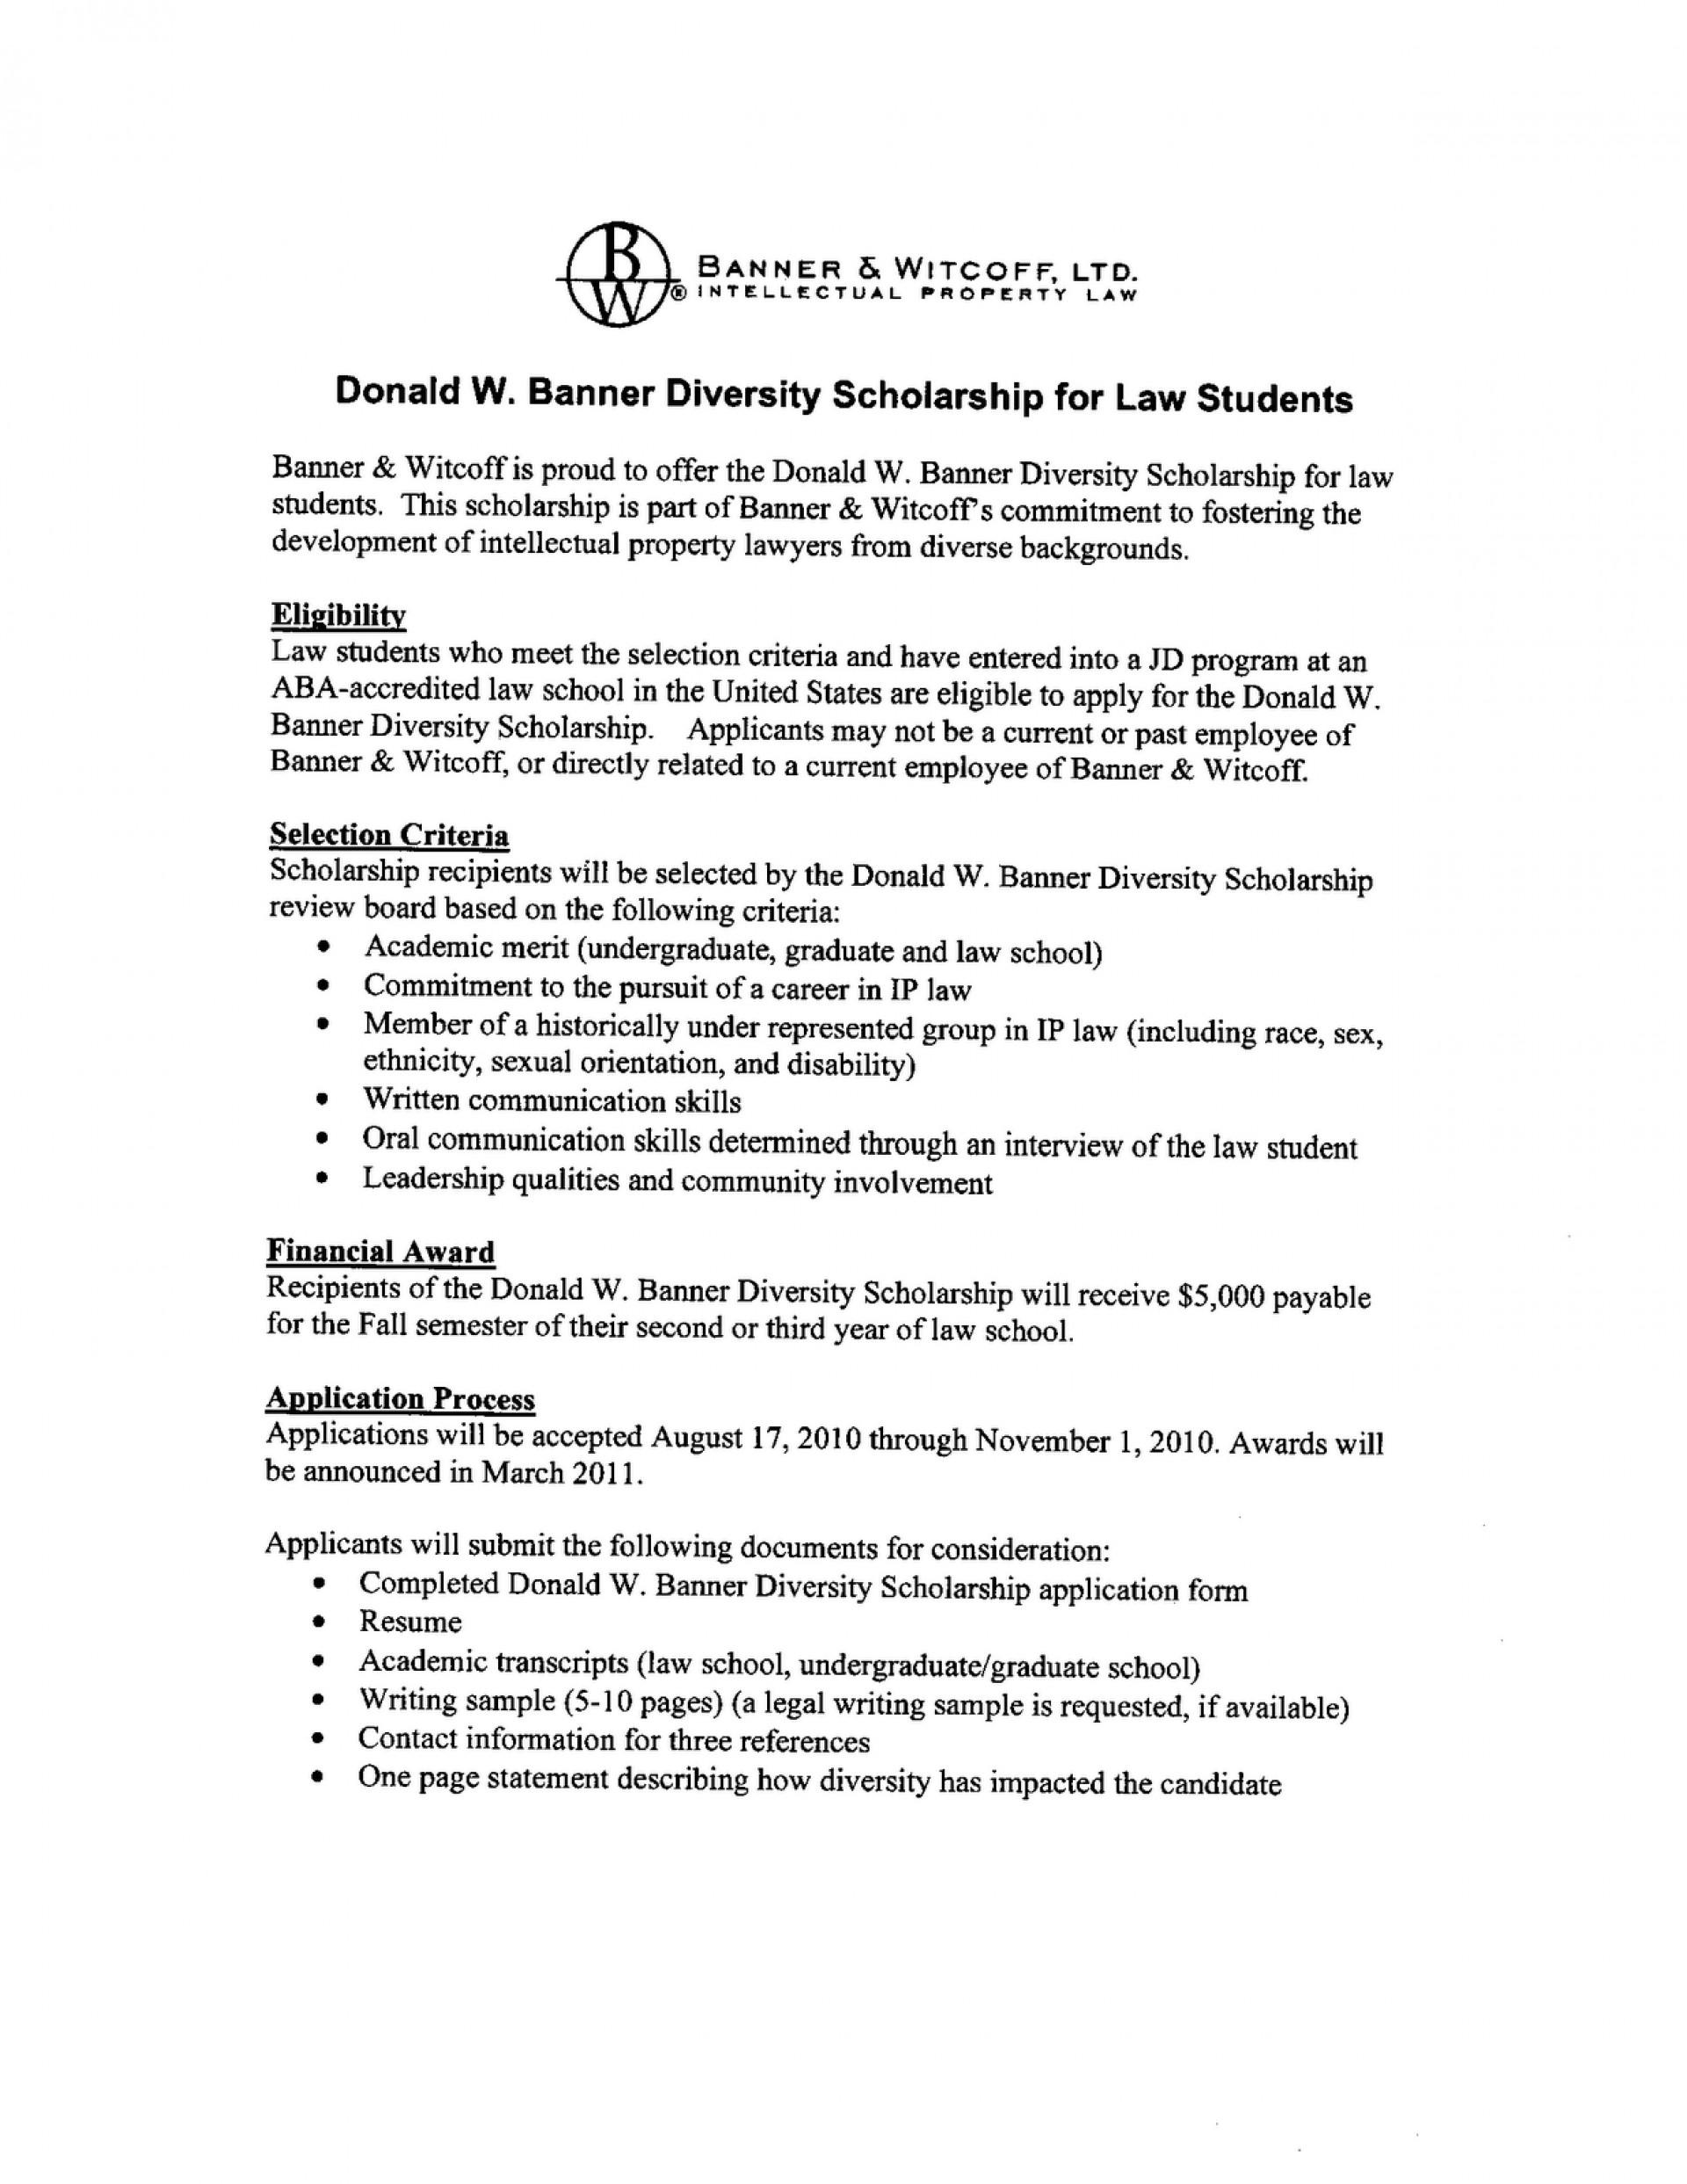 010 Harvard Accepted Essays Essay Fantastic Business School Reddit College Book 1920